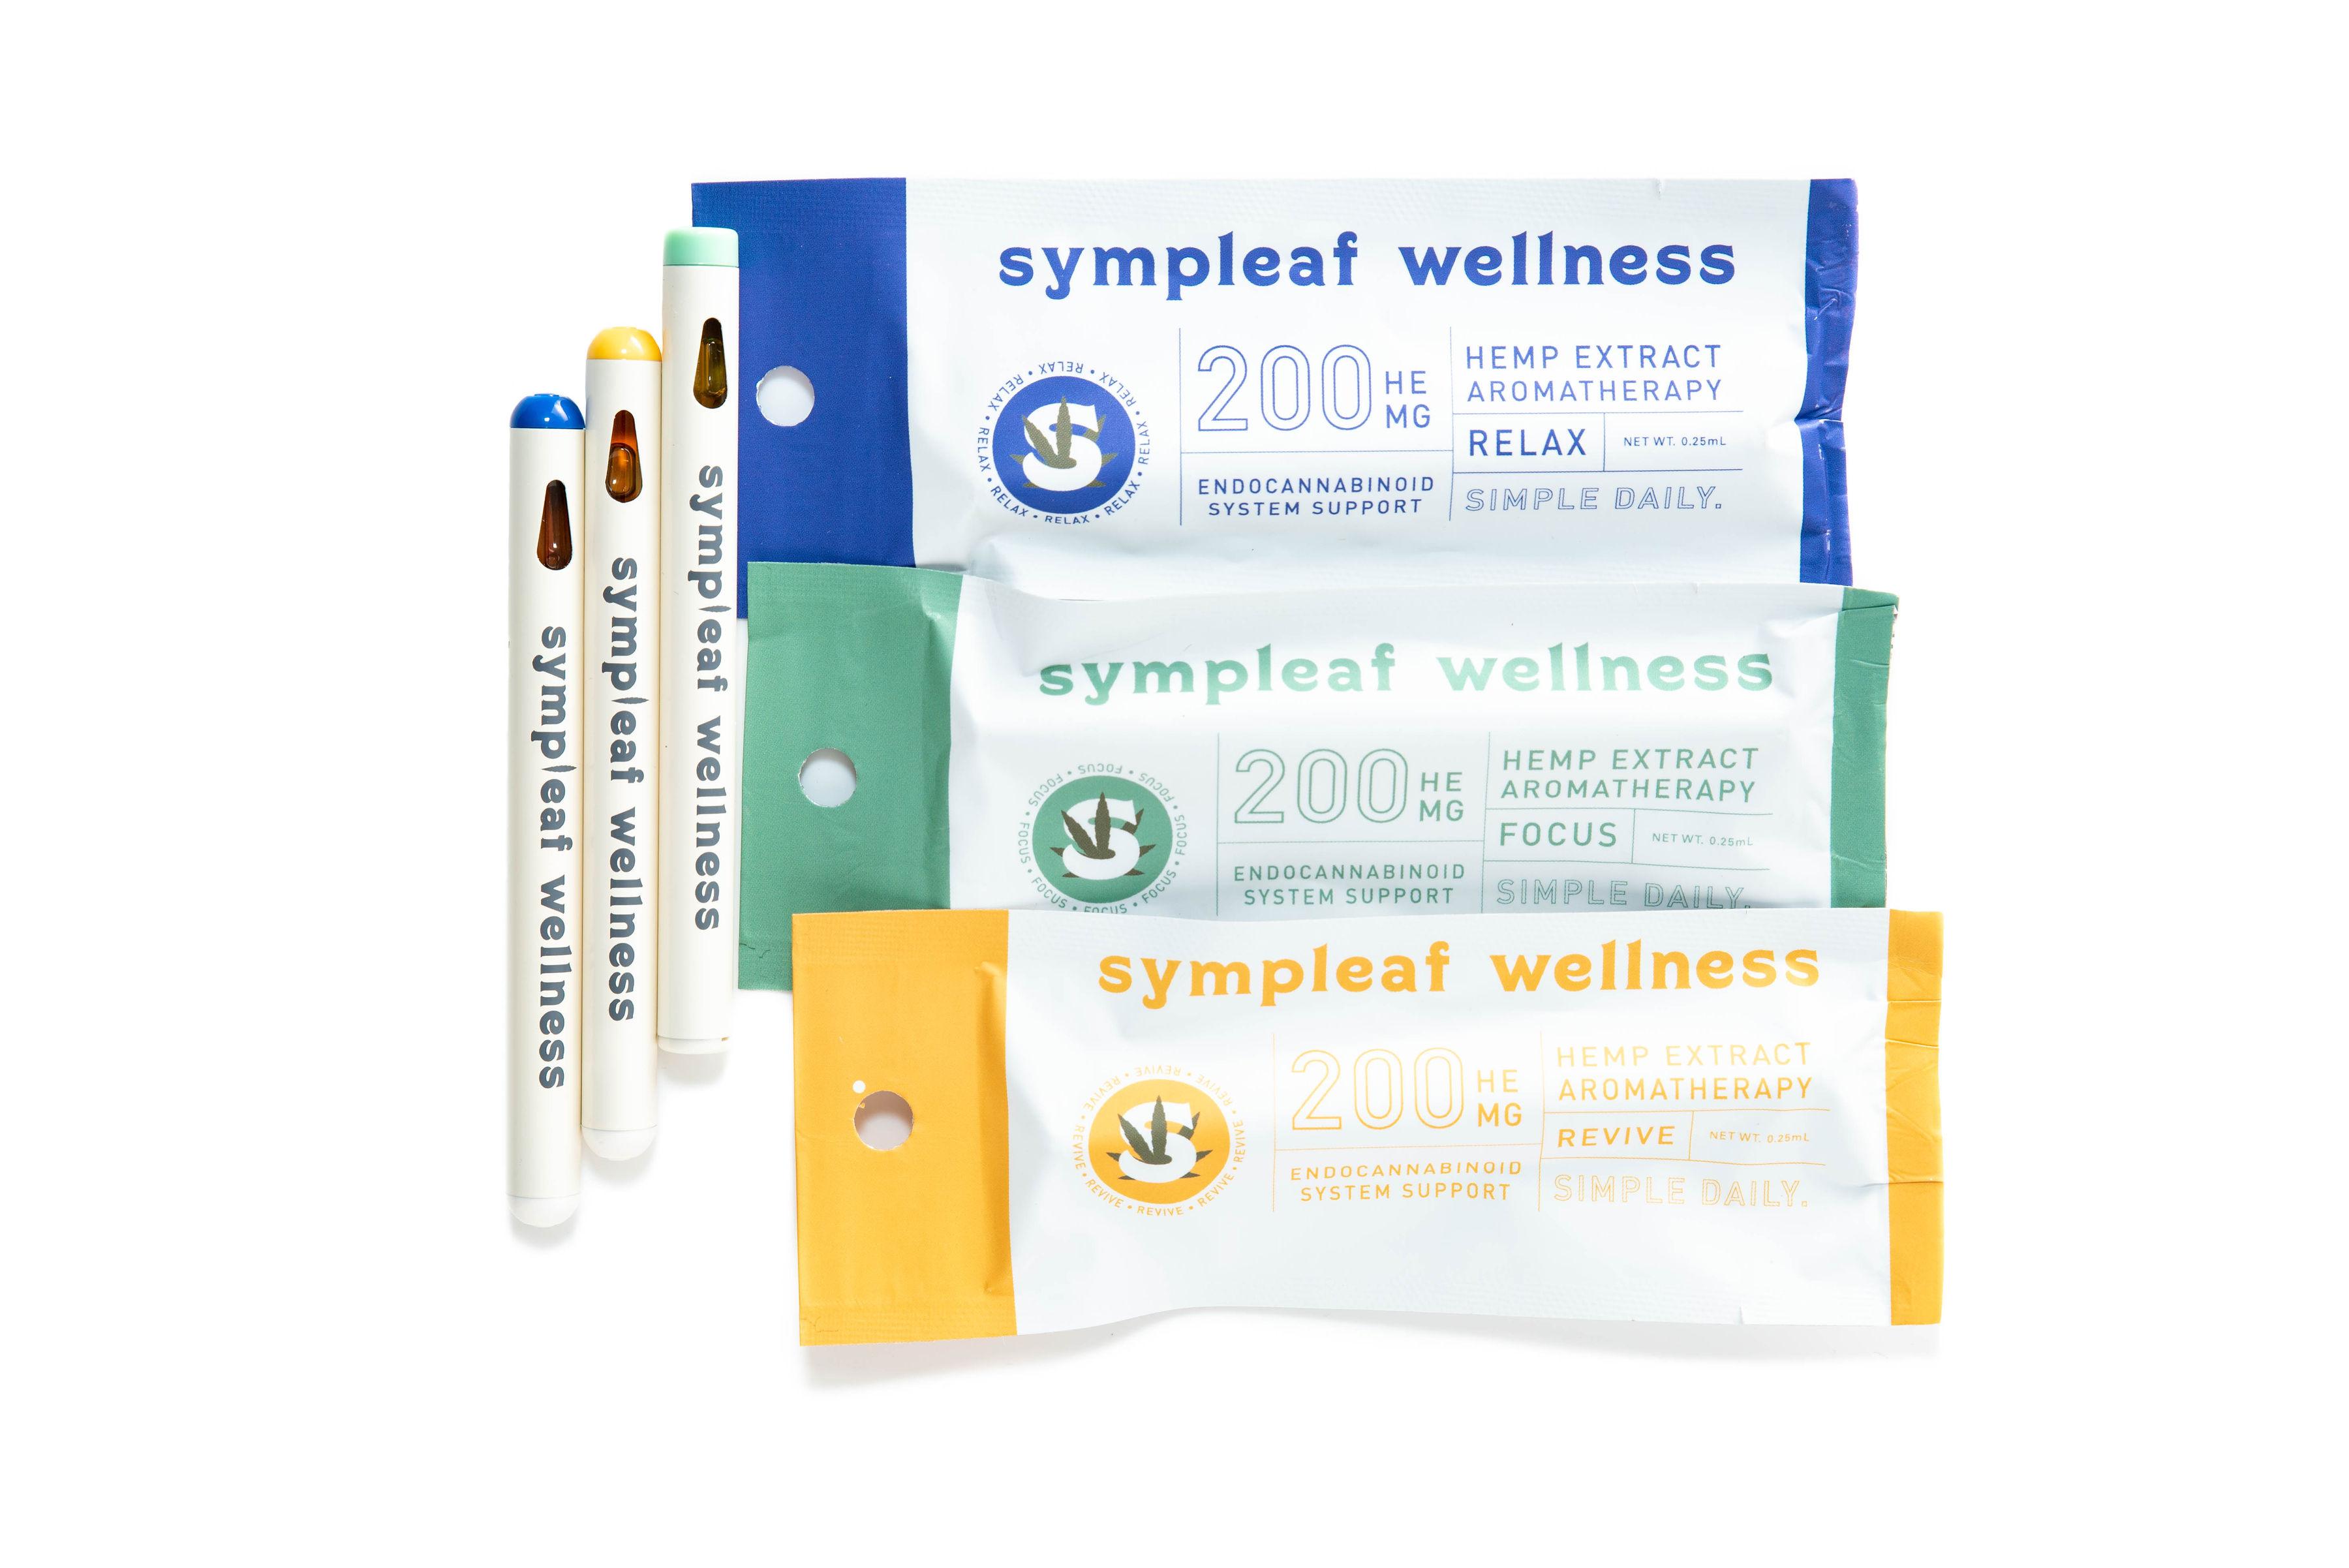 Sympleaf Wellness Hemp Extract Aromatherapy Terpene Kit (3 ct) – 200mg CBD  per unit